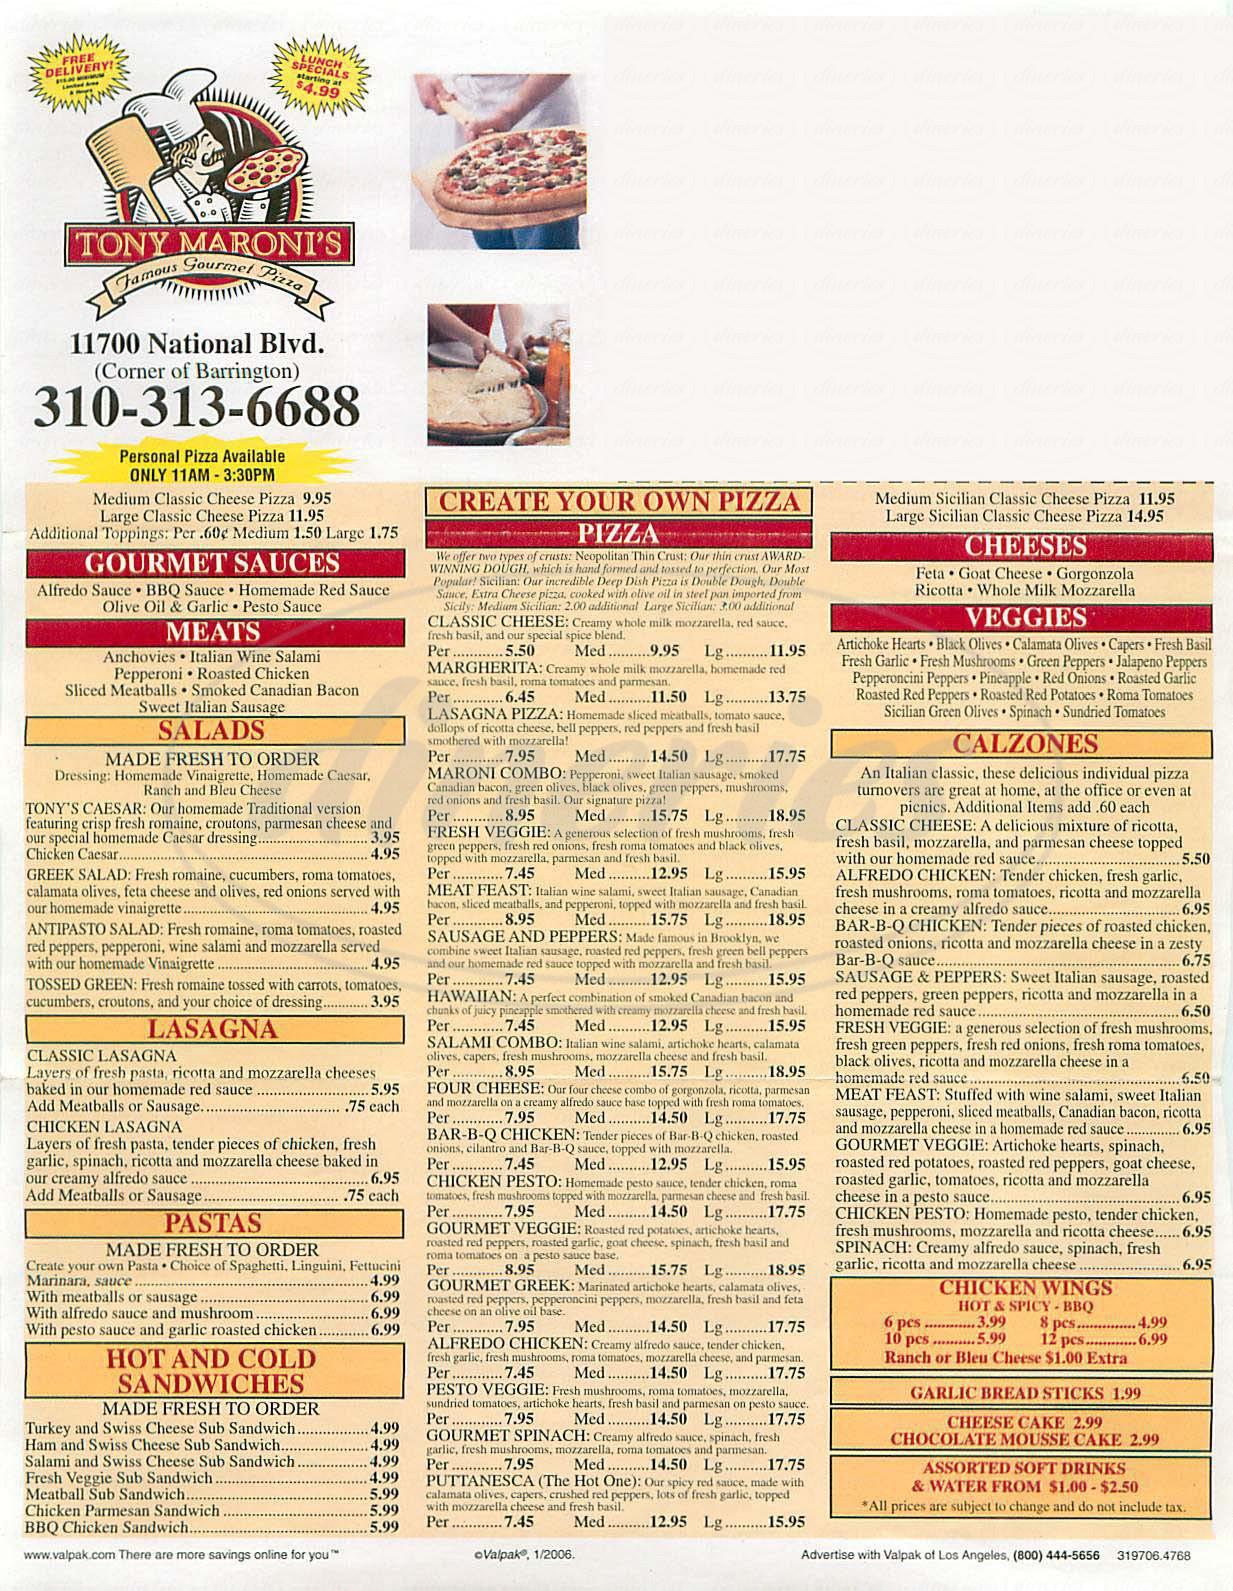 menu for Tony Maronis Famous Gourmet Pizza